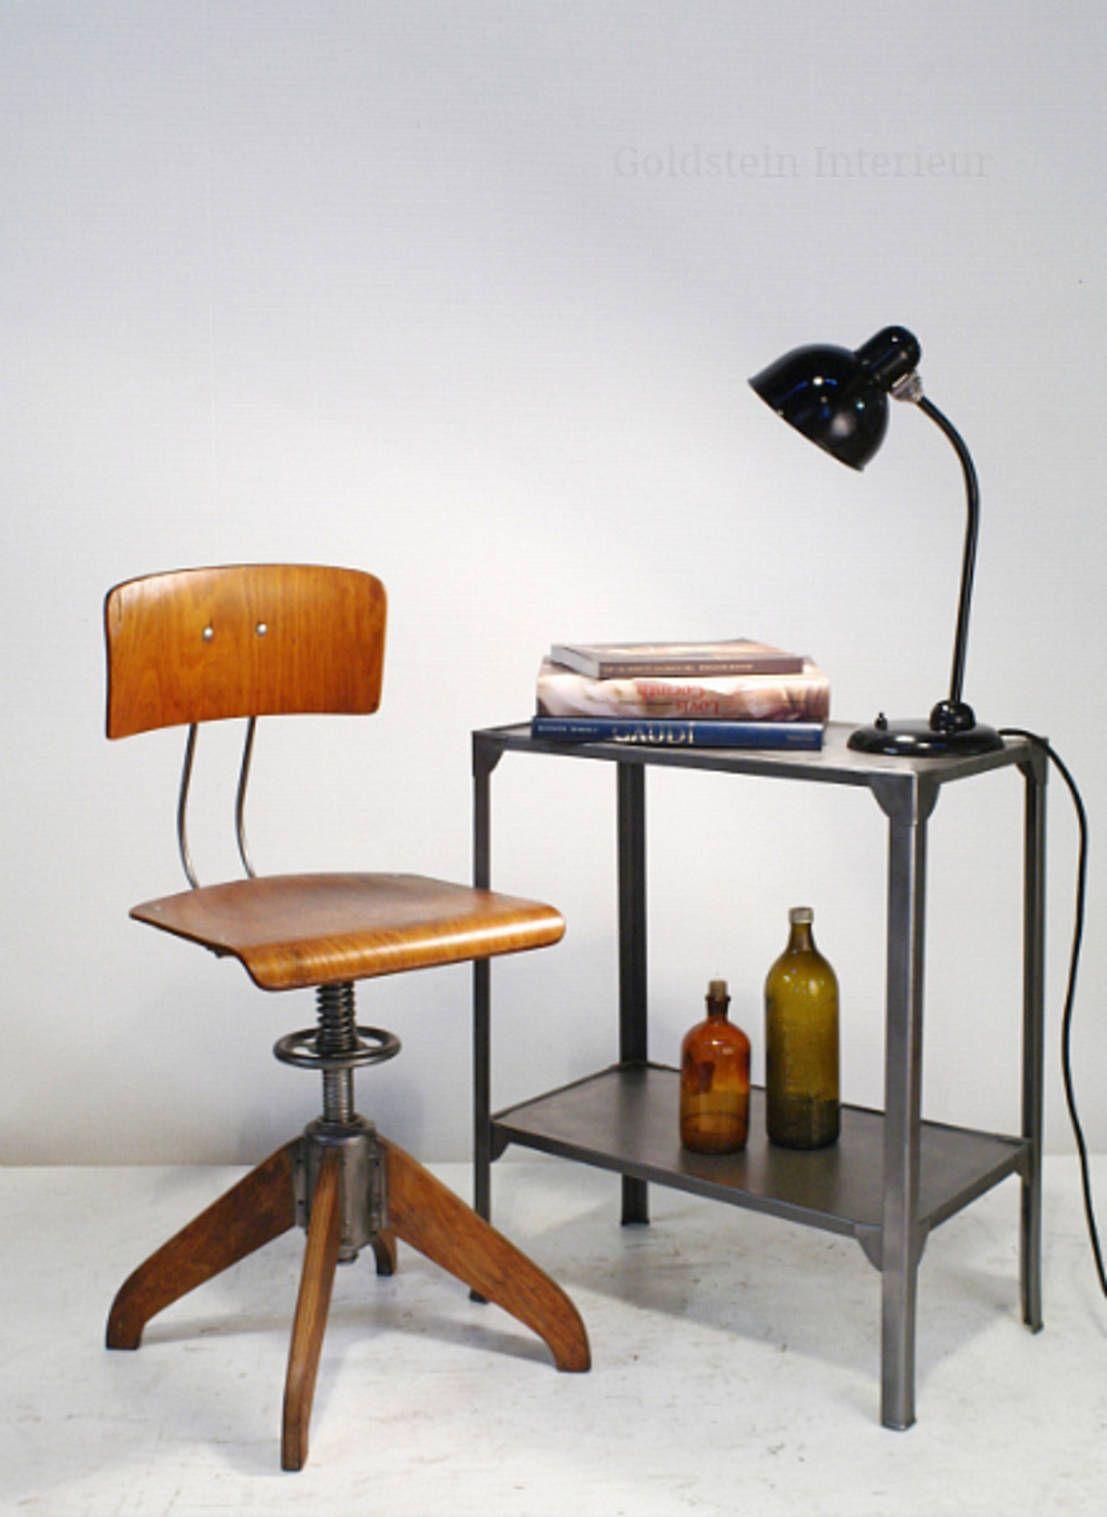 Vintage Möbel | Massenproduktion, vintage Möbel und Zeugen